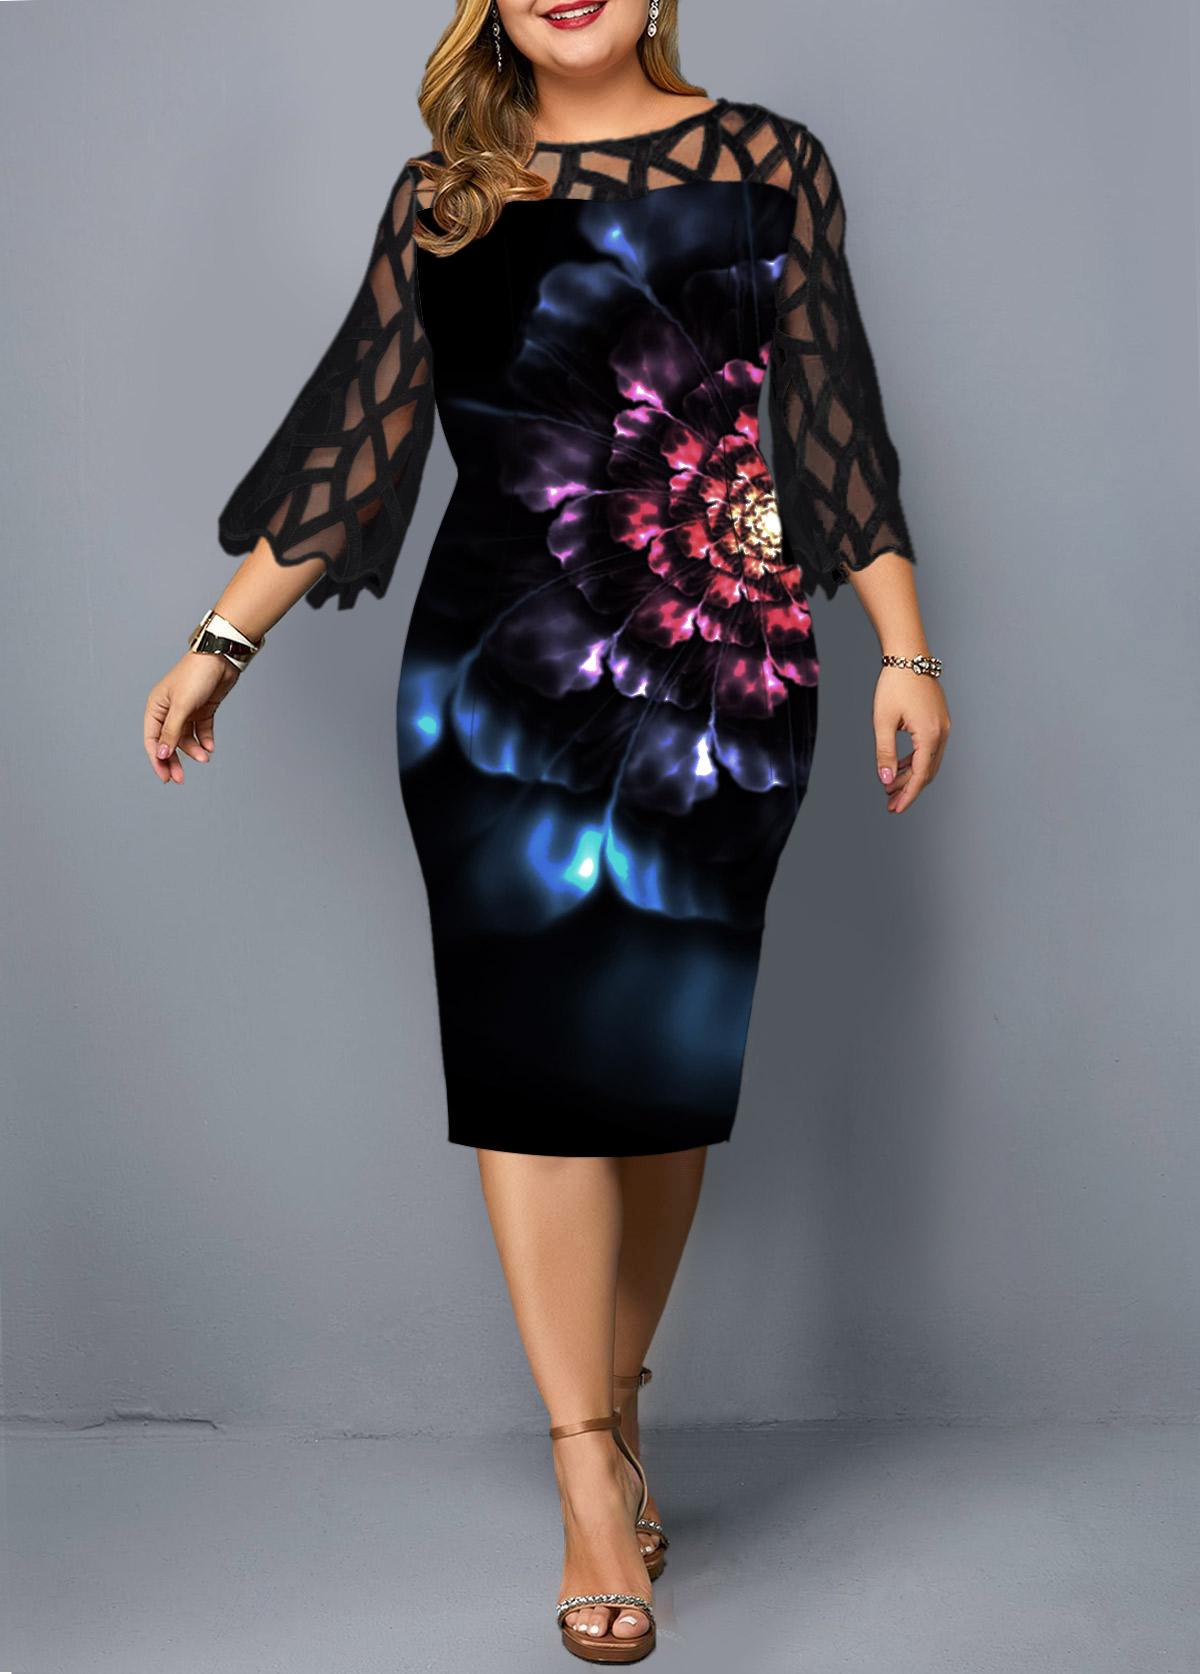 Lace Panel Flower Print Plus Size Sheath Dress